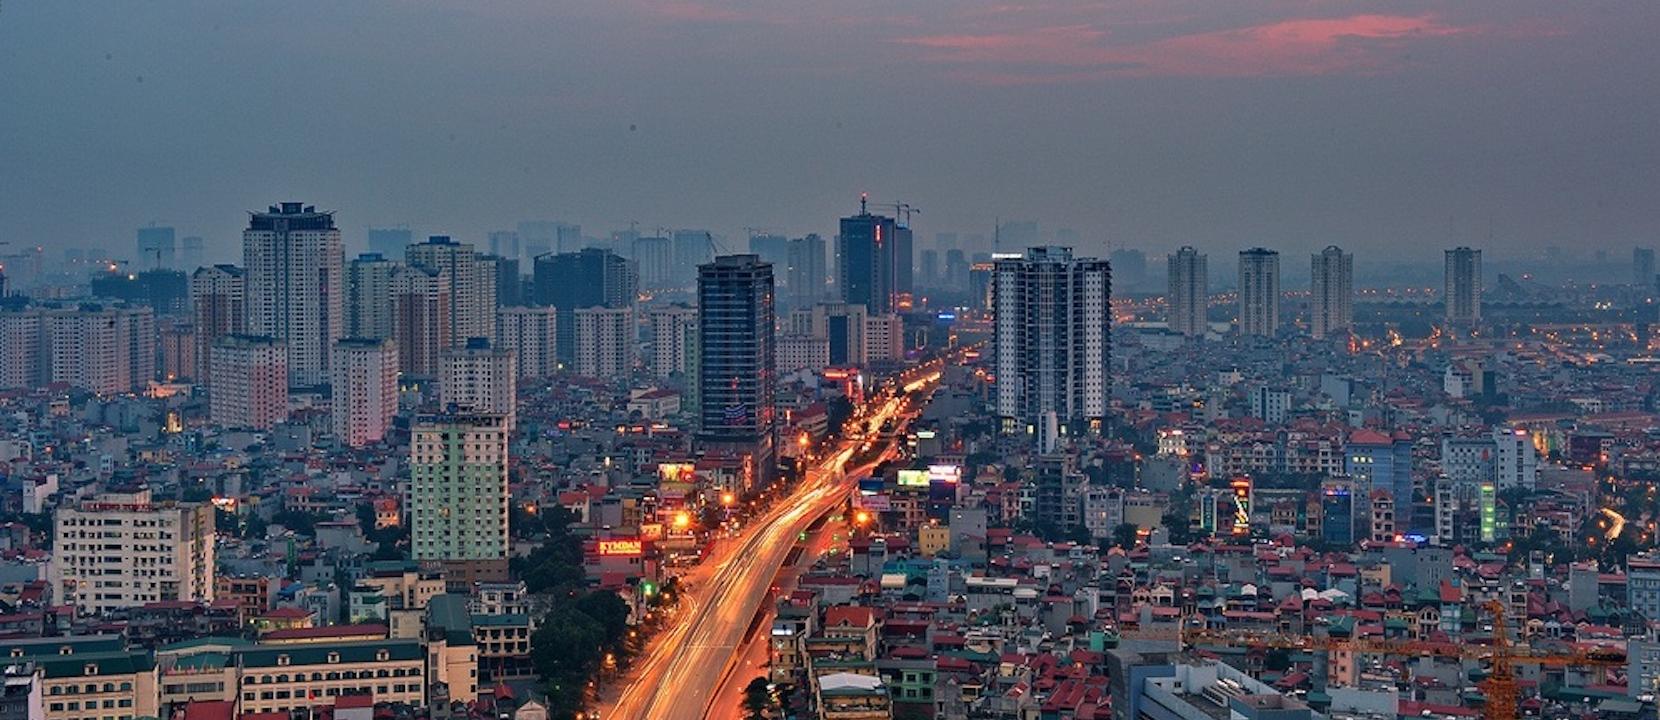 11 Day Classic Vietnam & Cambodia Tours (Luxury Private tour)